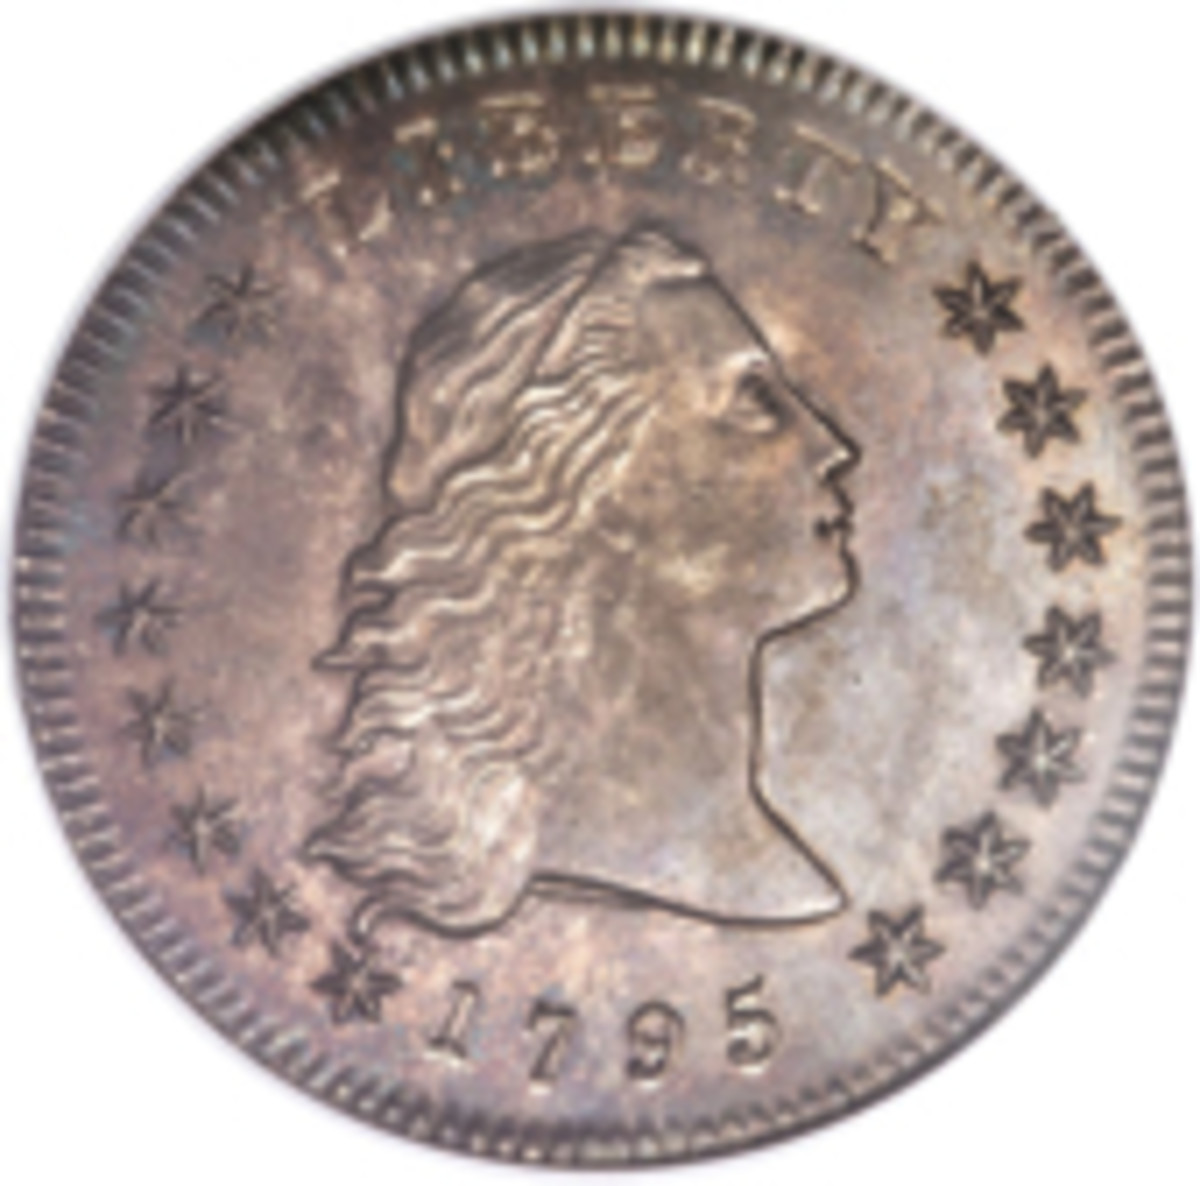 1795 silver dollar